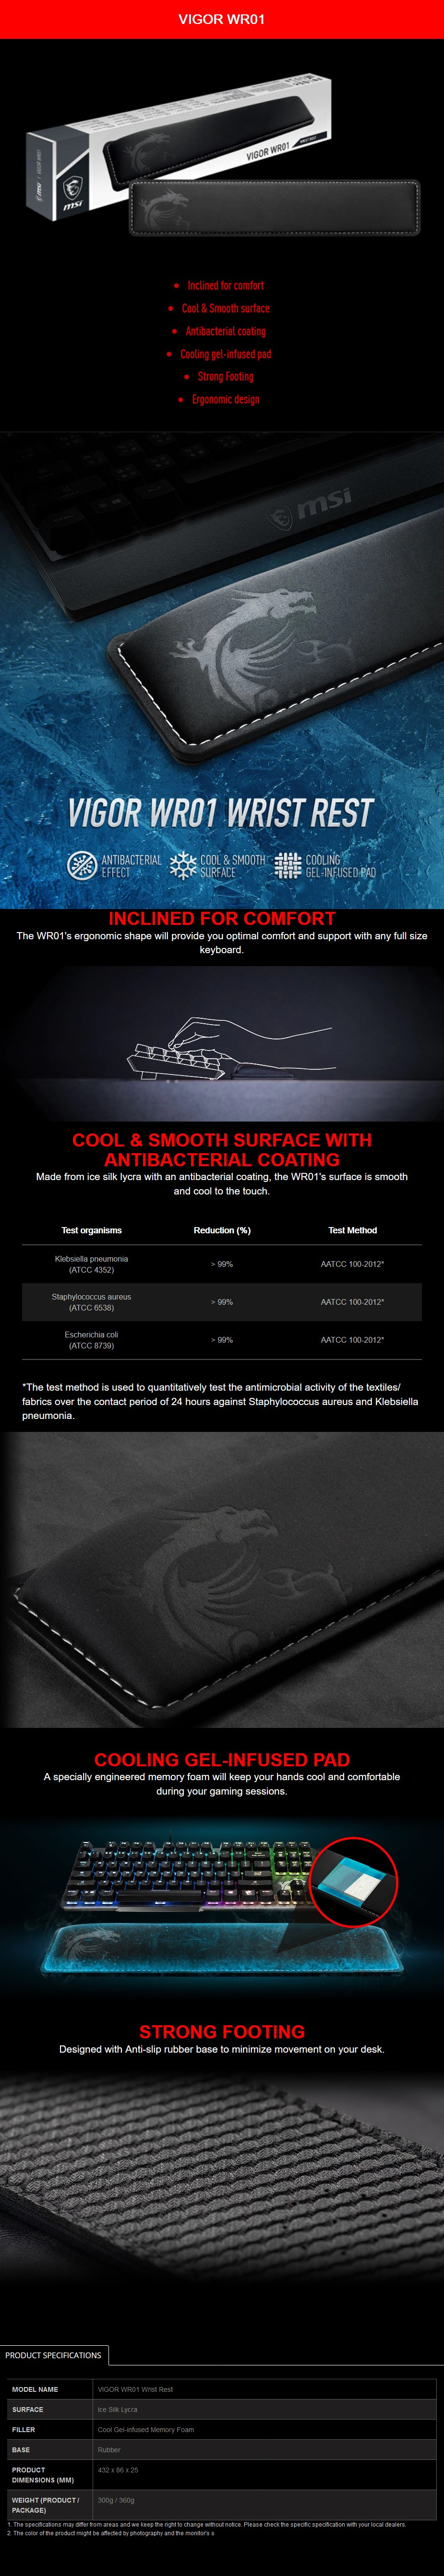 MSI Vigor WR01 Ergonomic Keyboard Cooling Wrist Rest - Overview 1